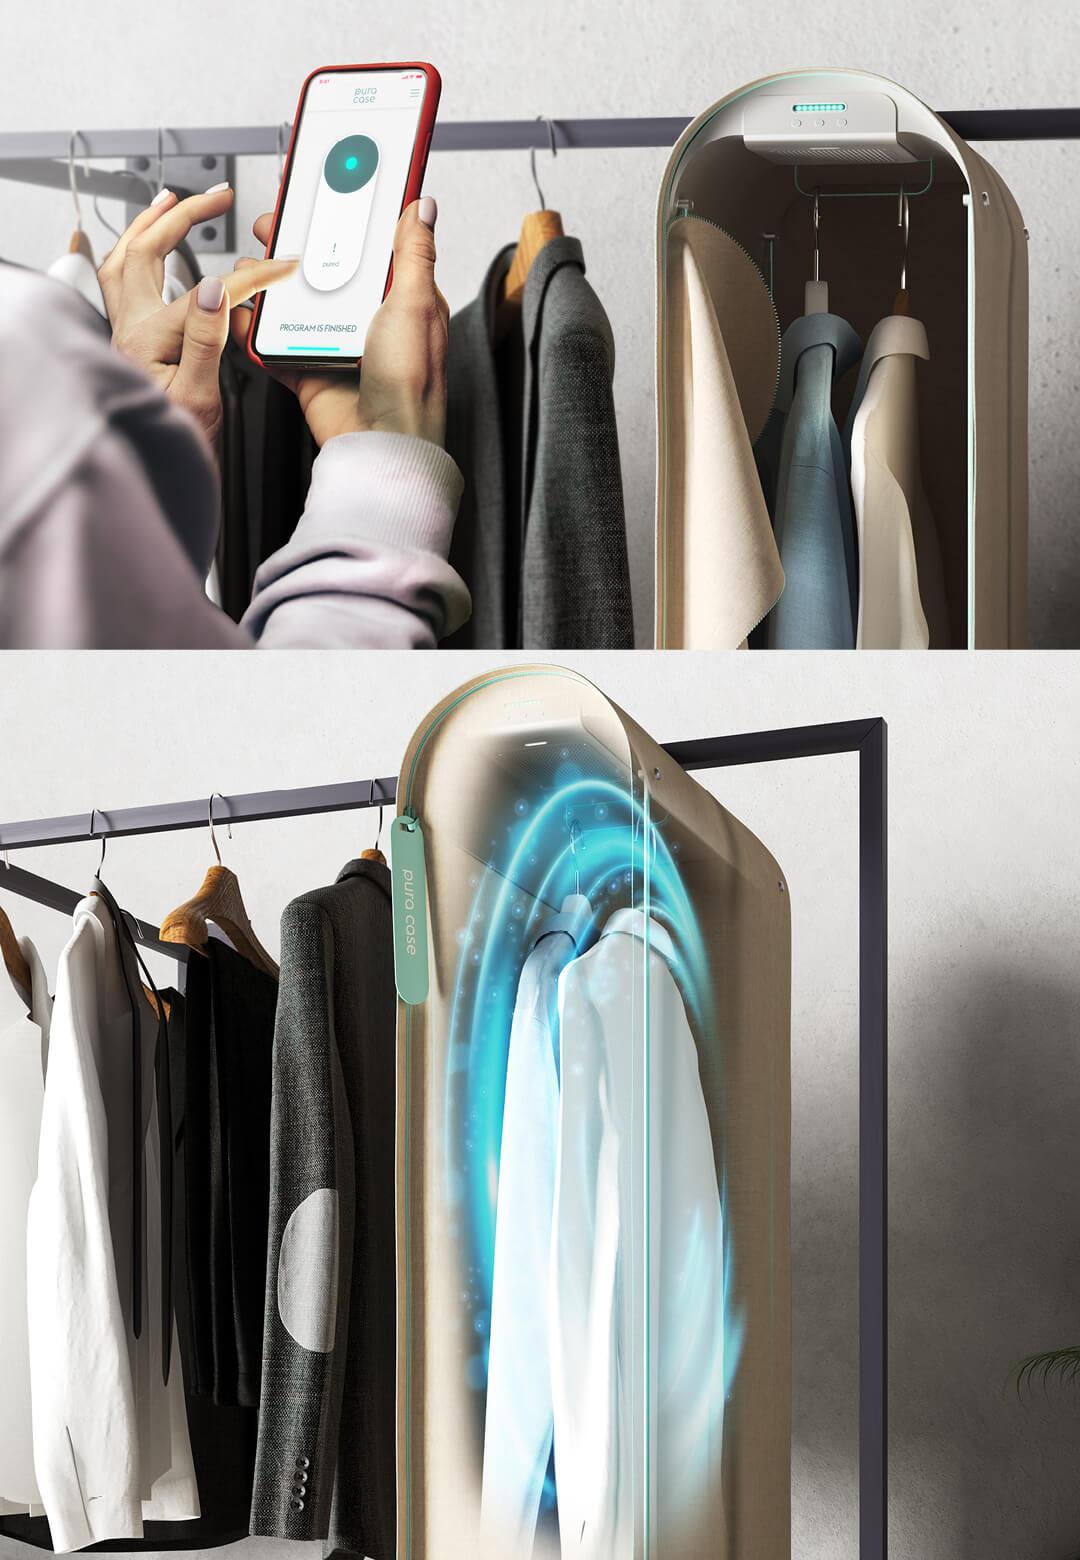 Pura-Case is a design prototype designed by Carlo Ratti Associati for tech startup Scribit | Pura-Case by Carlo Ratti Associati | STIRworld